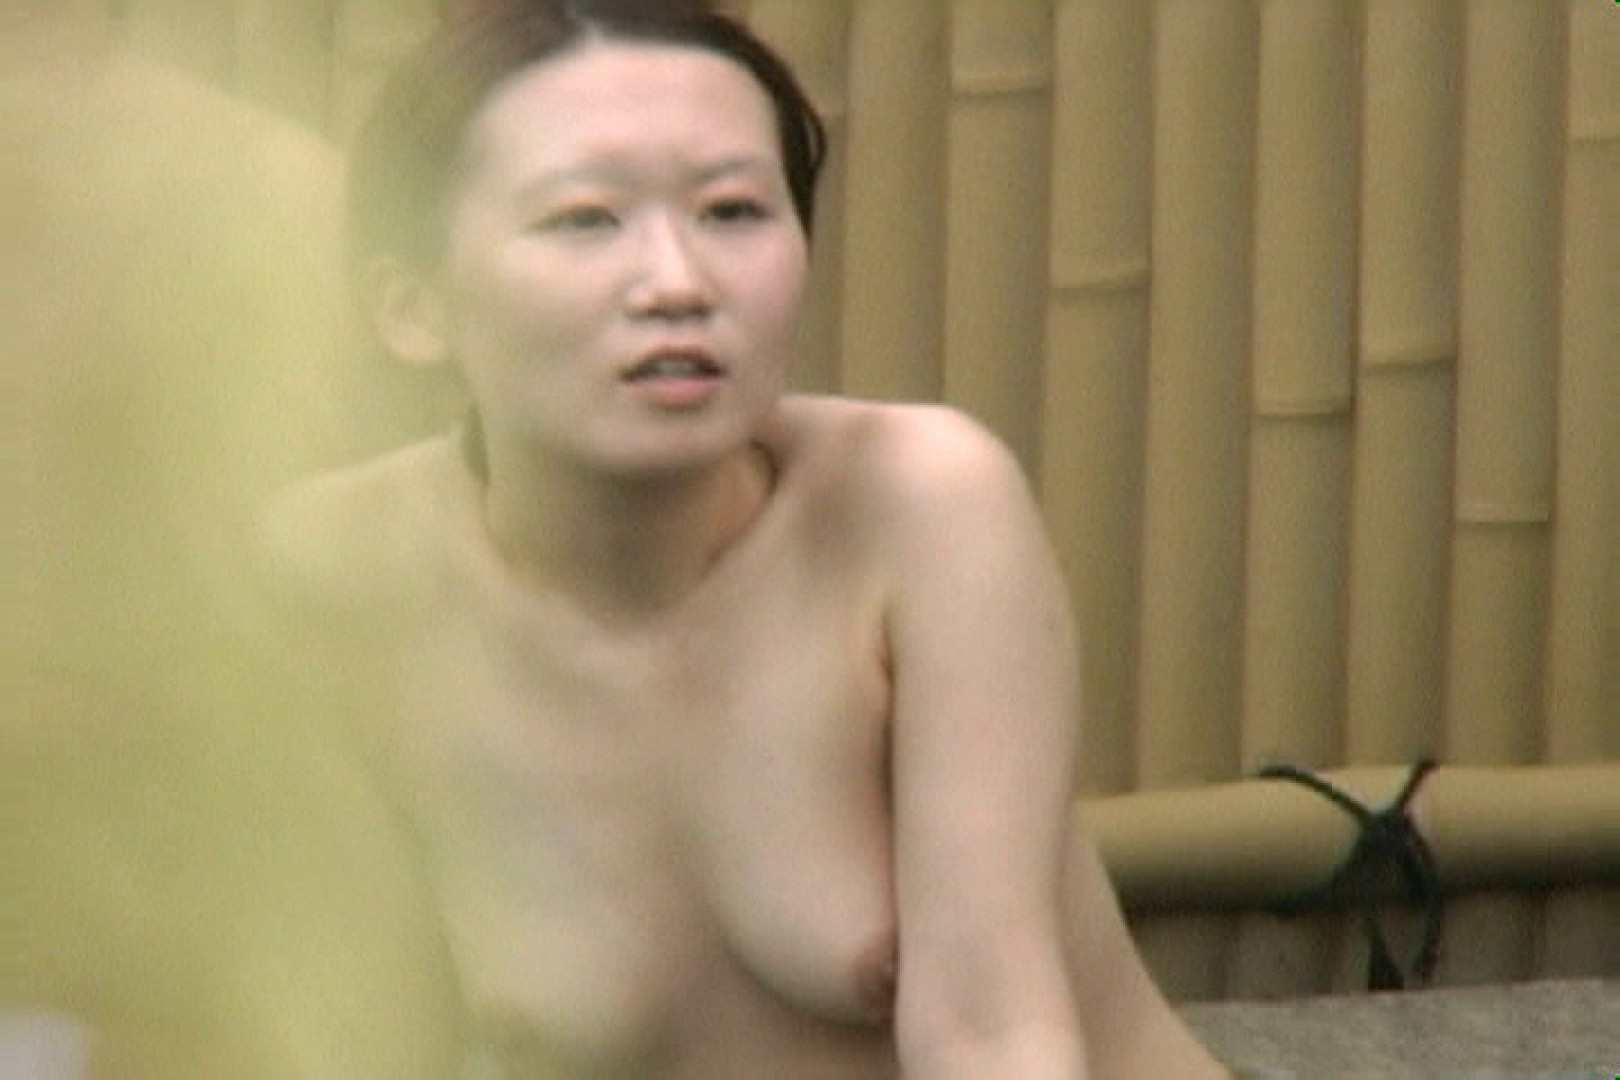 Aquaな露天風呂Vol.10【VIP】 0 | 0  55連発 17